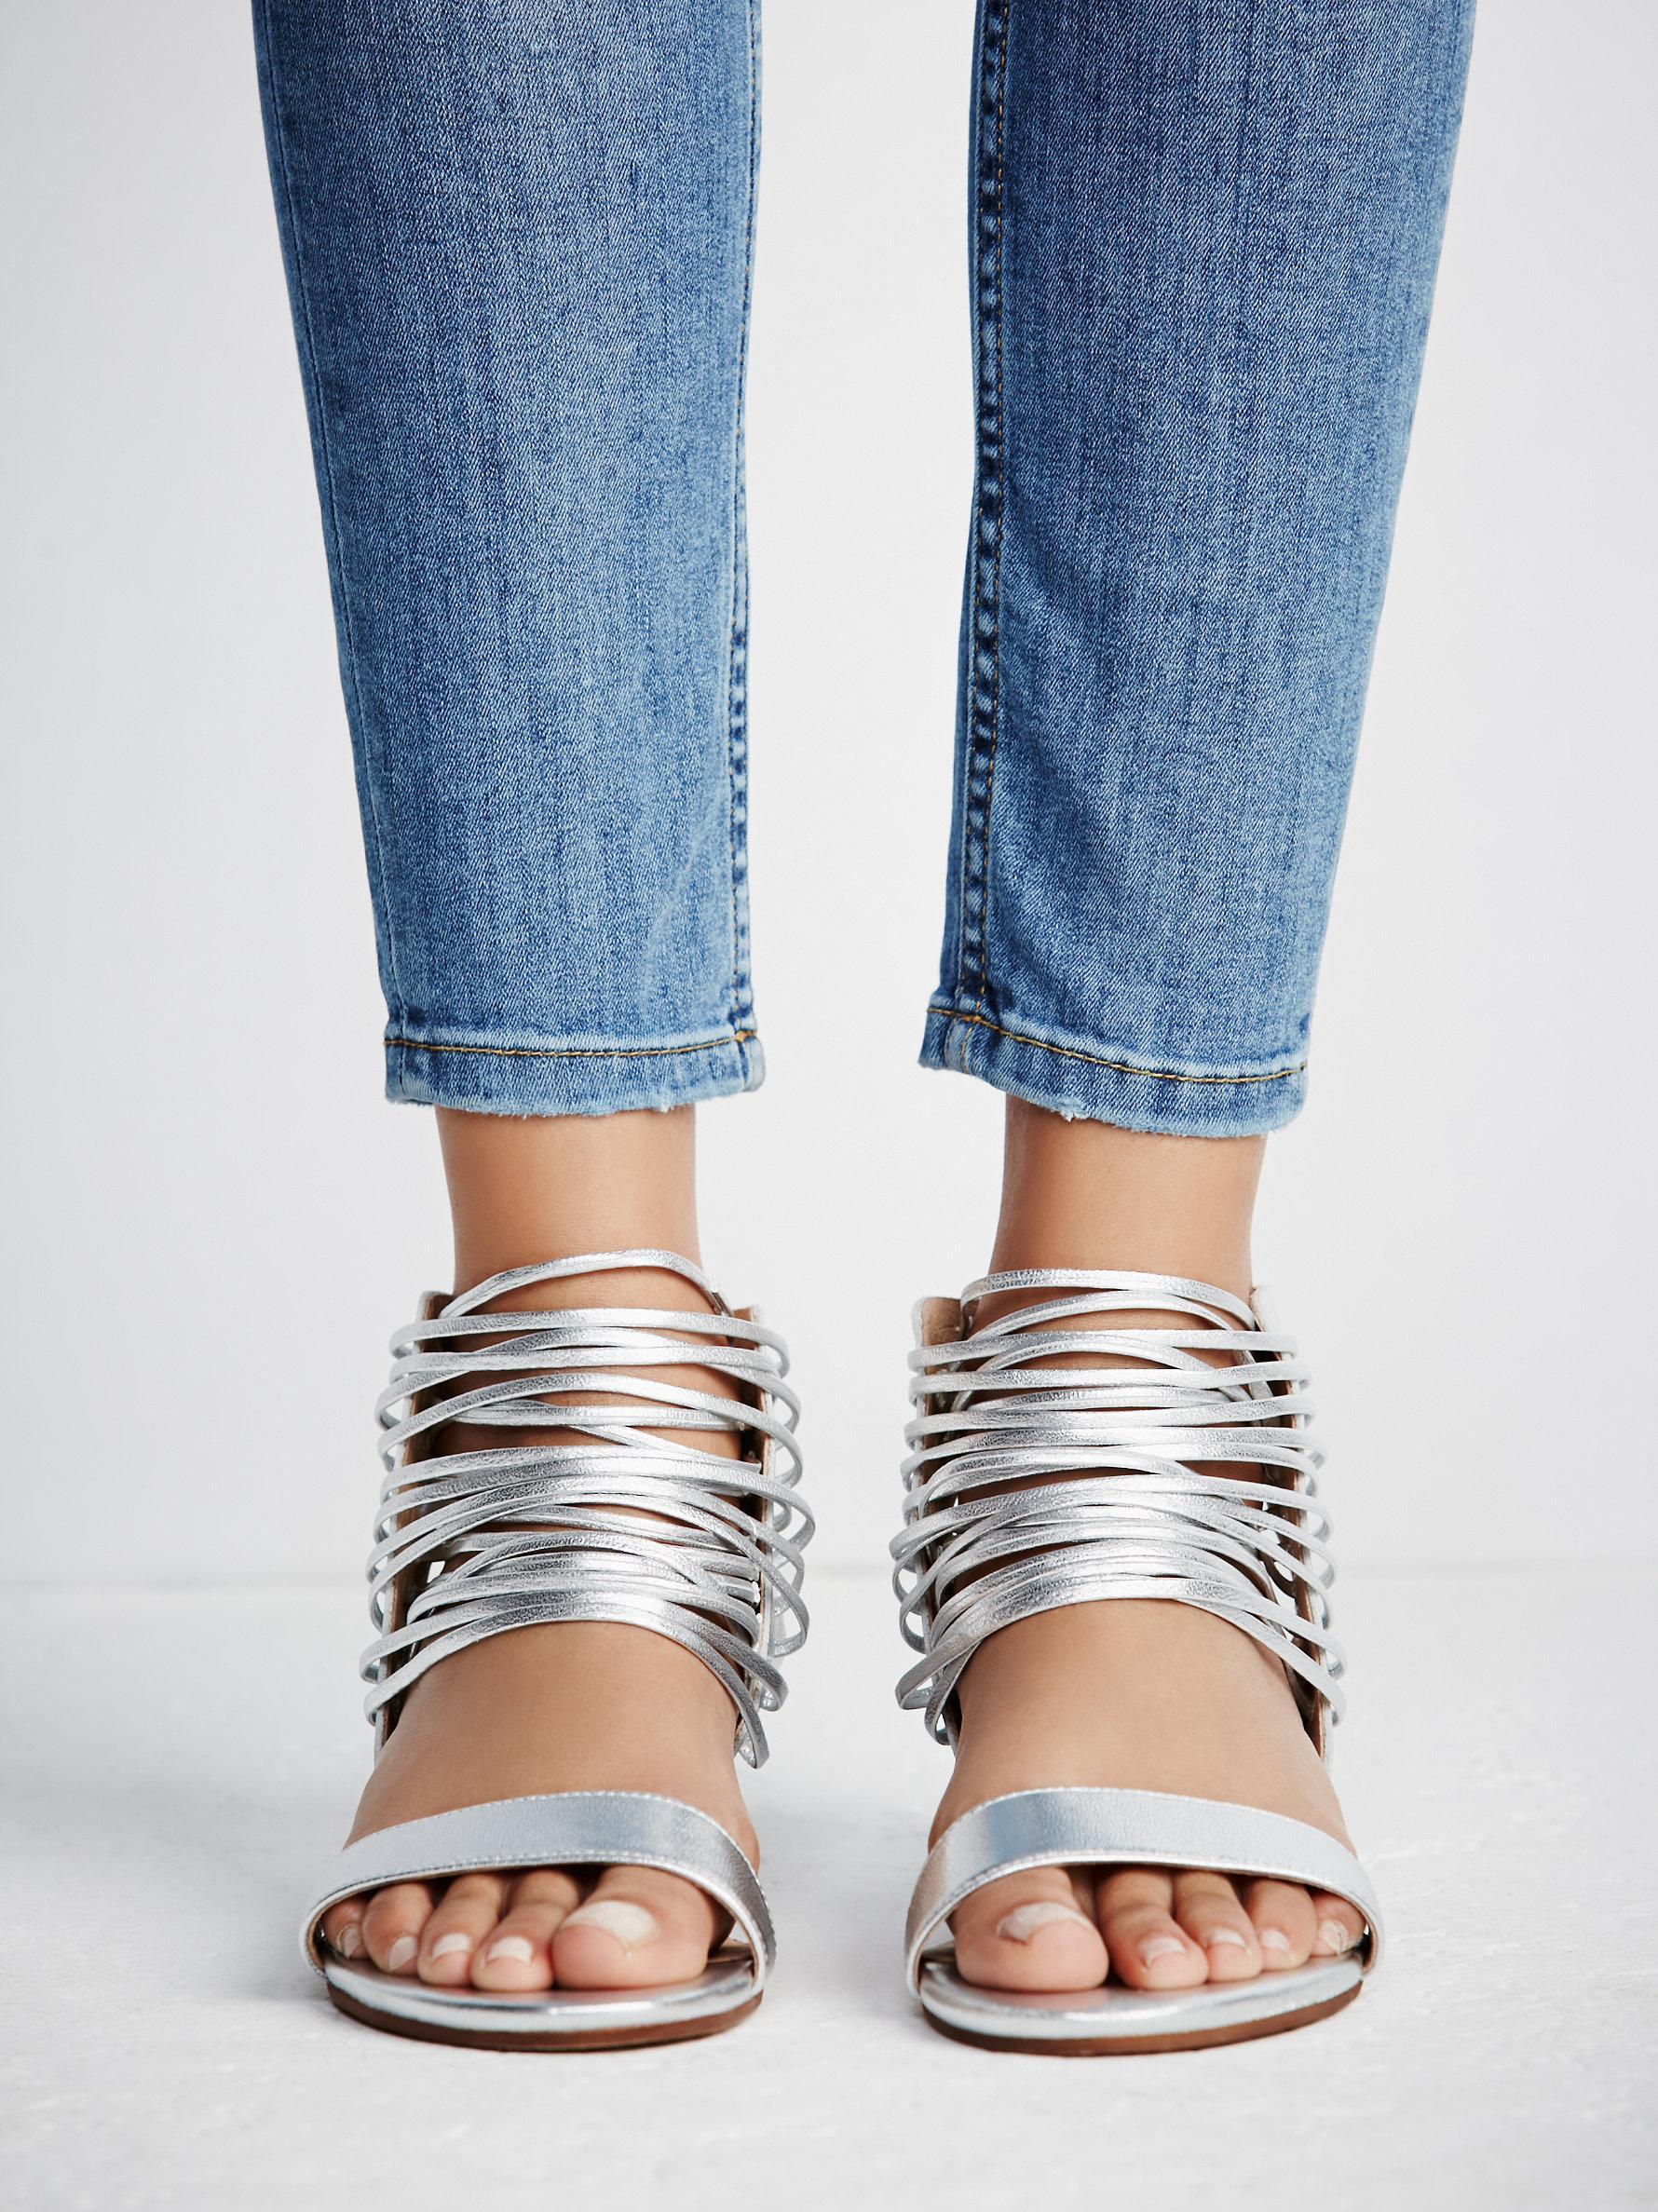 1d753bae861 Lyst - Free People Cascading Mini Wedge Sandal